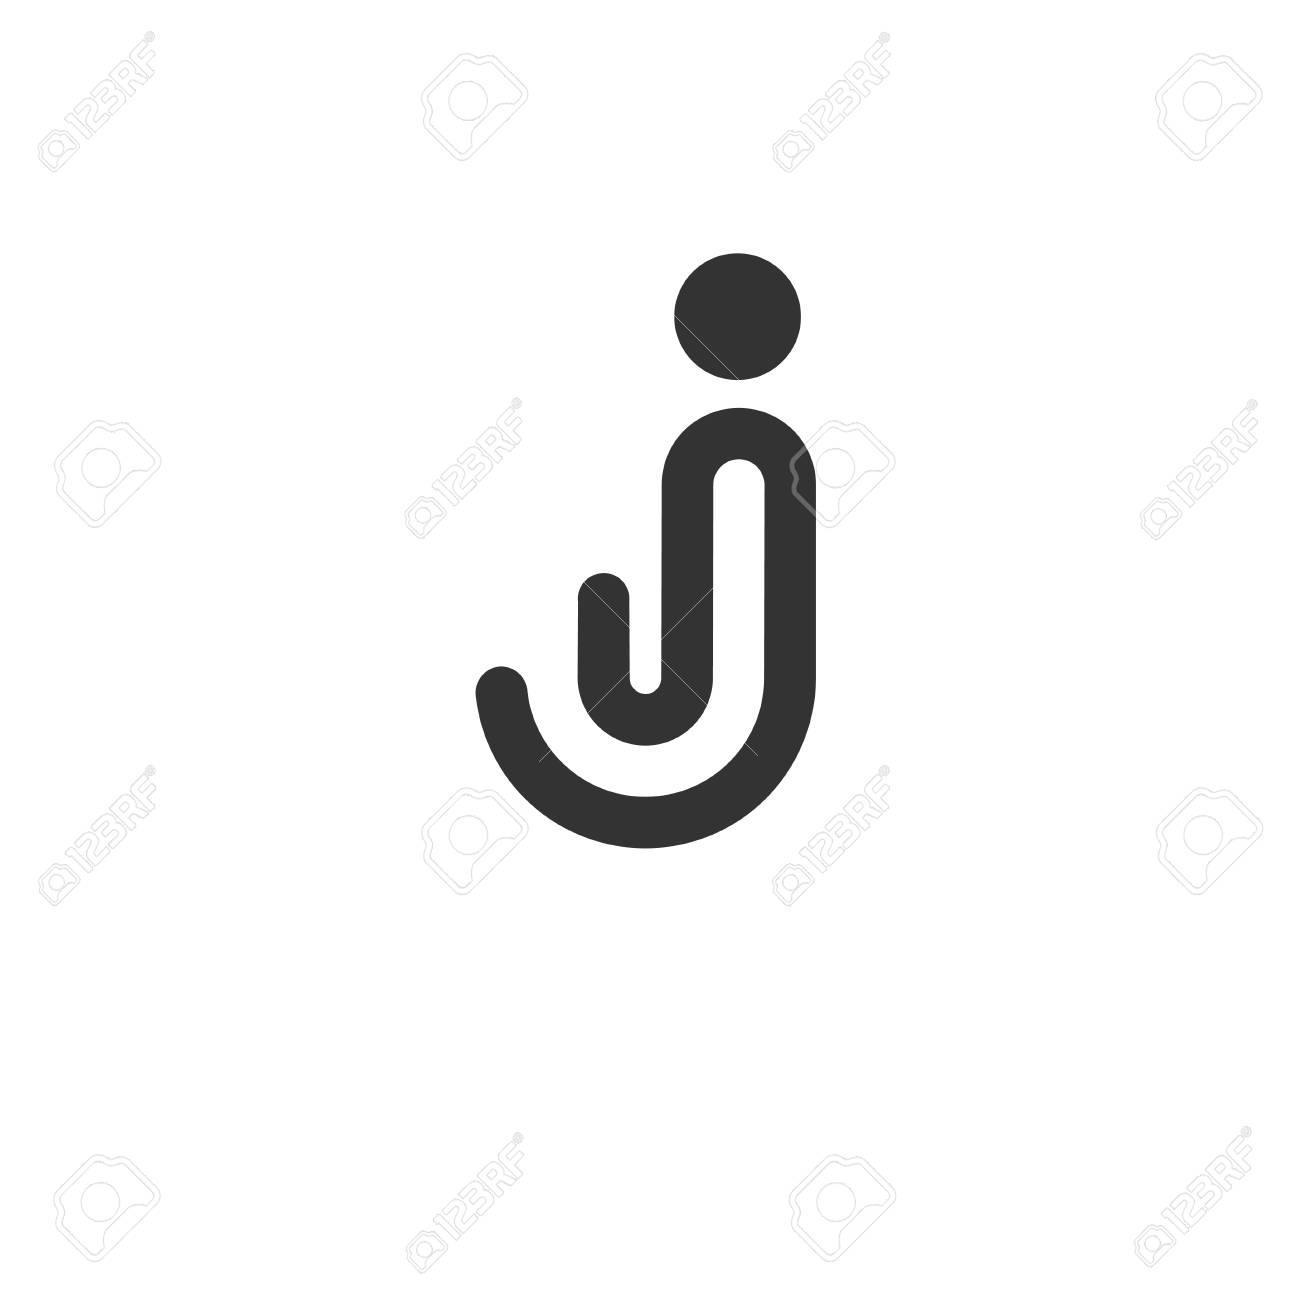 letter j logo design concept vector template abstract stock vector 70872108